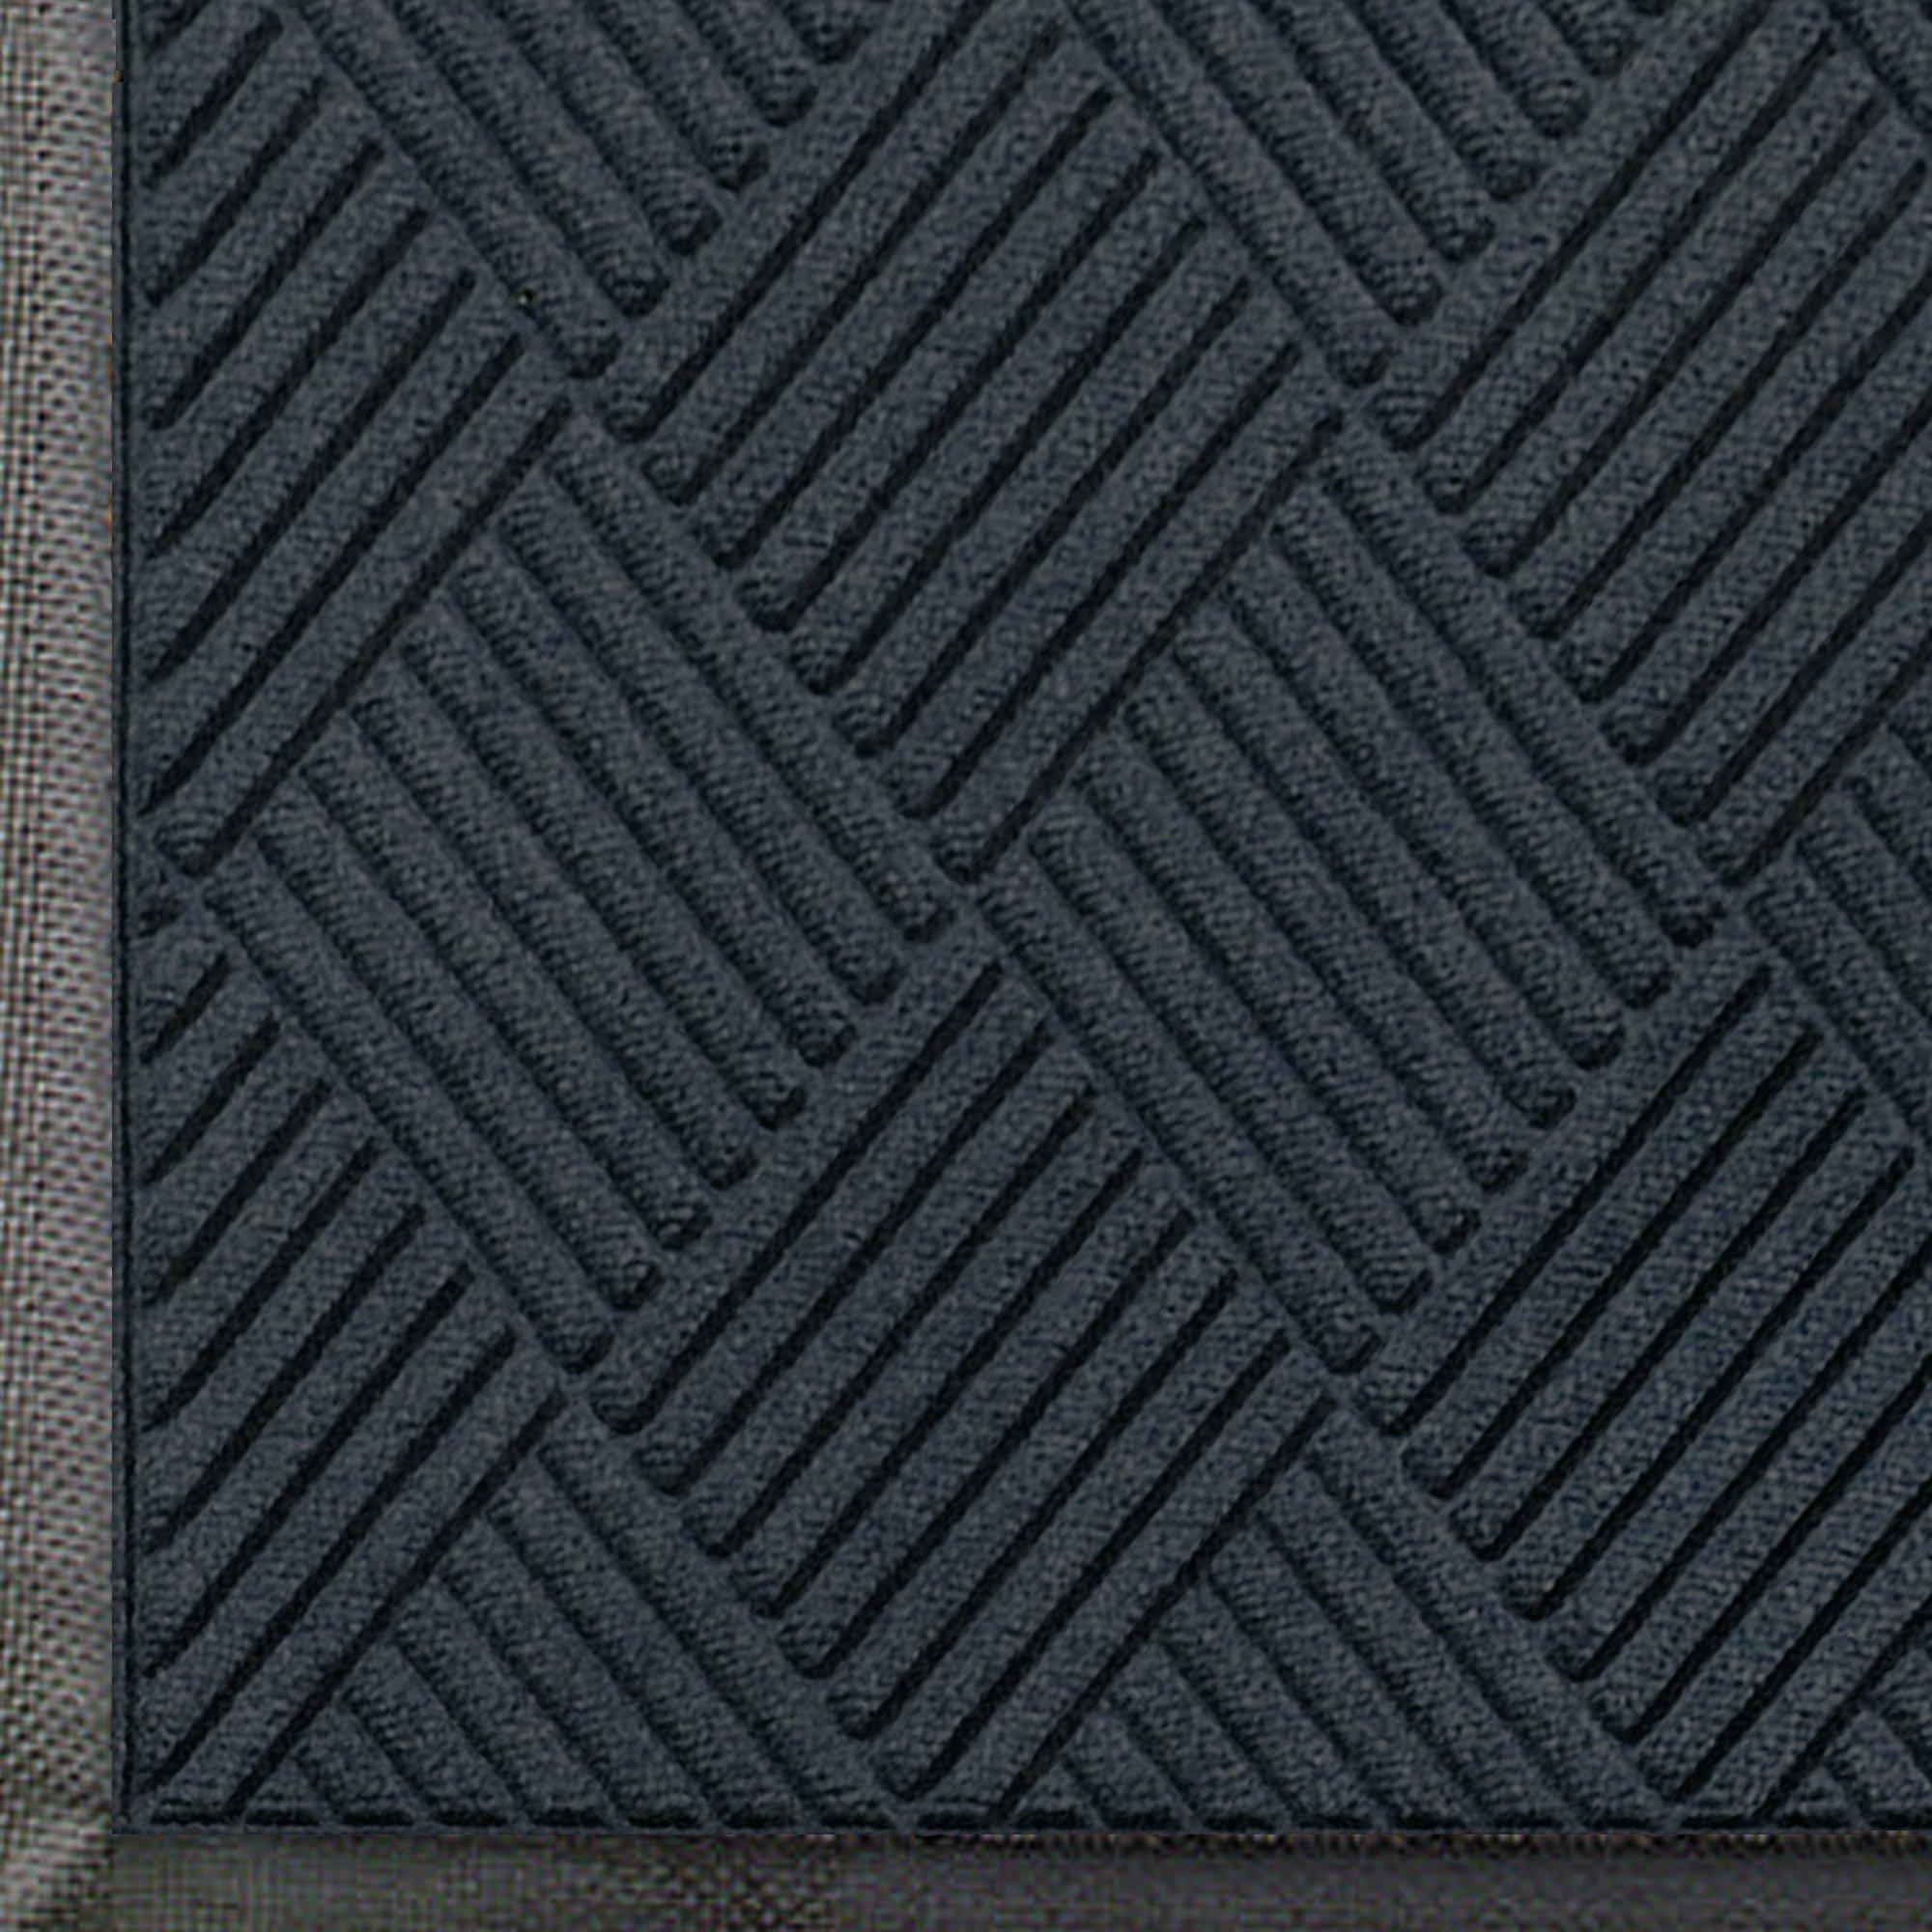 Andersen 208 WaterHog Classic Diamond Polypropylene Fiber Entrance Indoor/Outdoor Floor Mat, SBR Rubber Backing, 6' Length x 4' Width, 3/8'' Thick, Charcoal